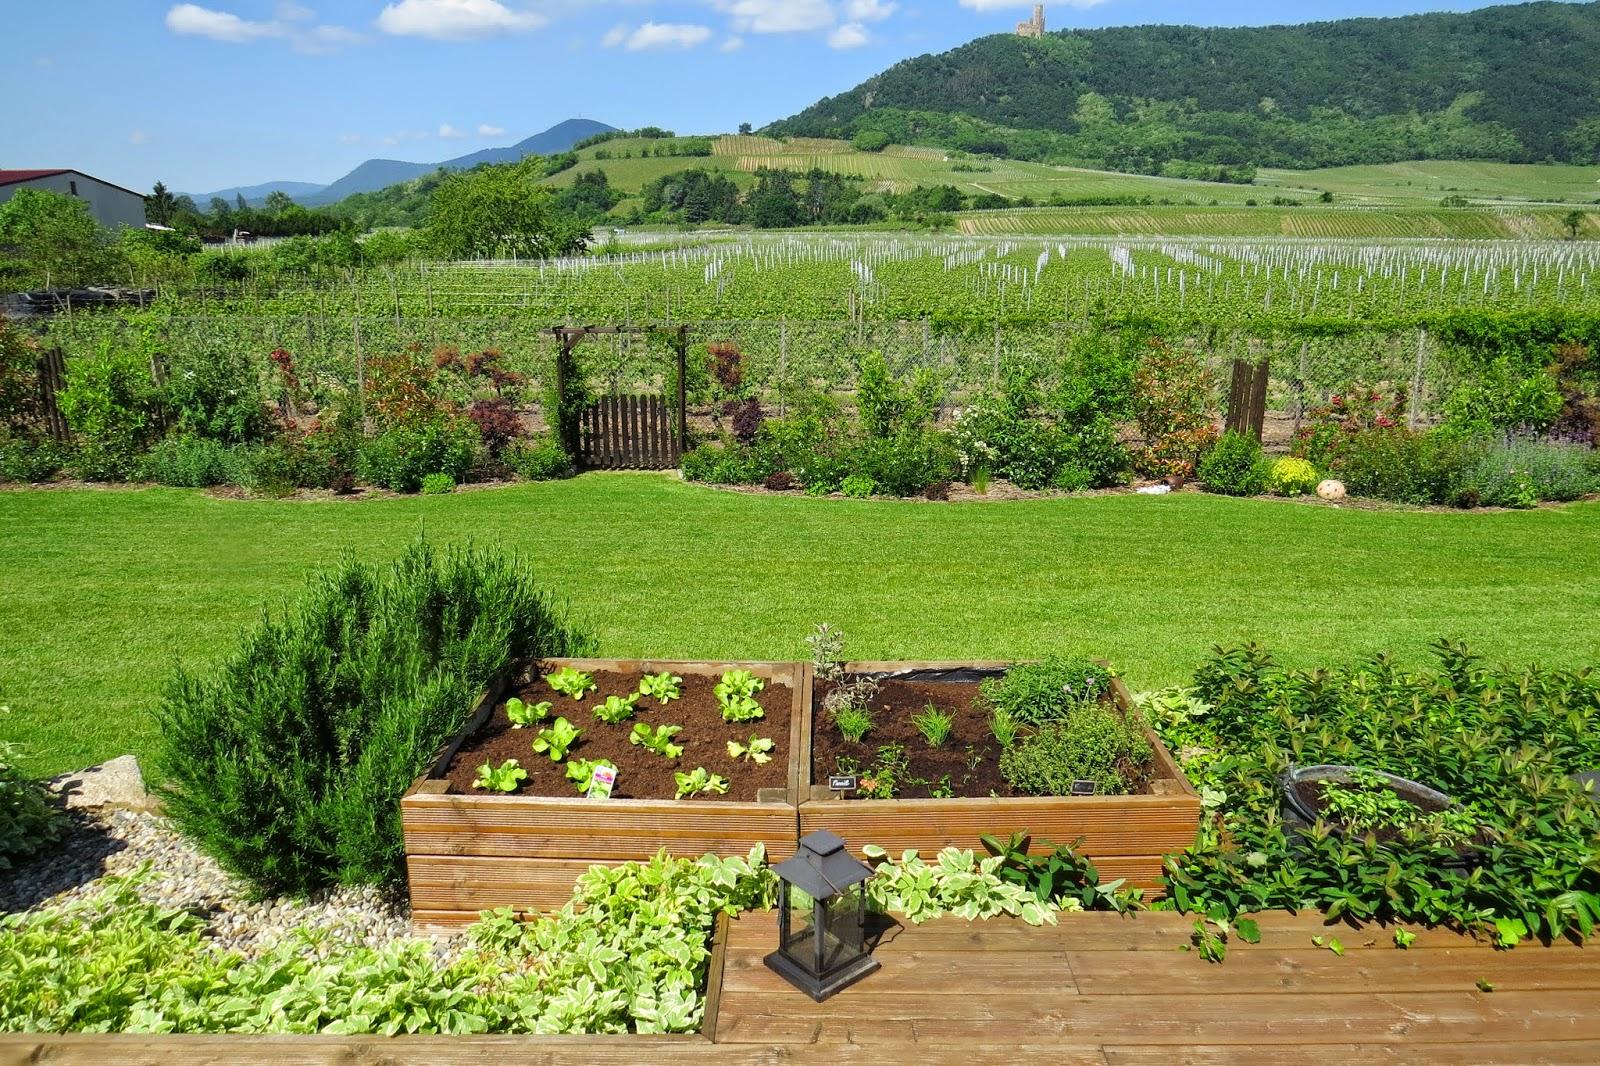 Jardin alsace vignoble for Entretien poivron jardin